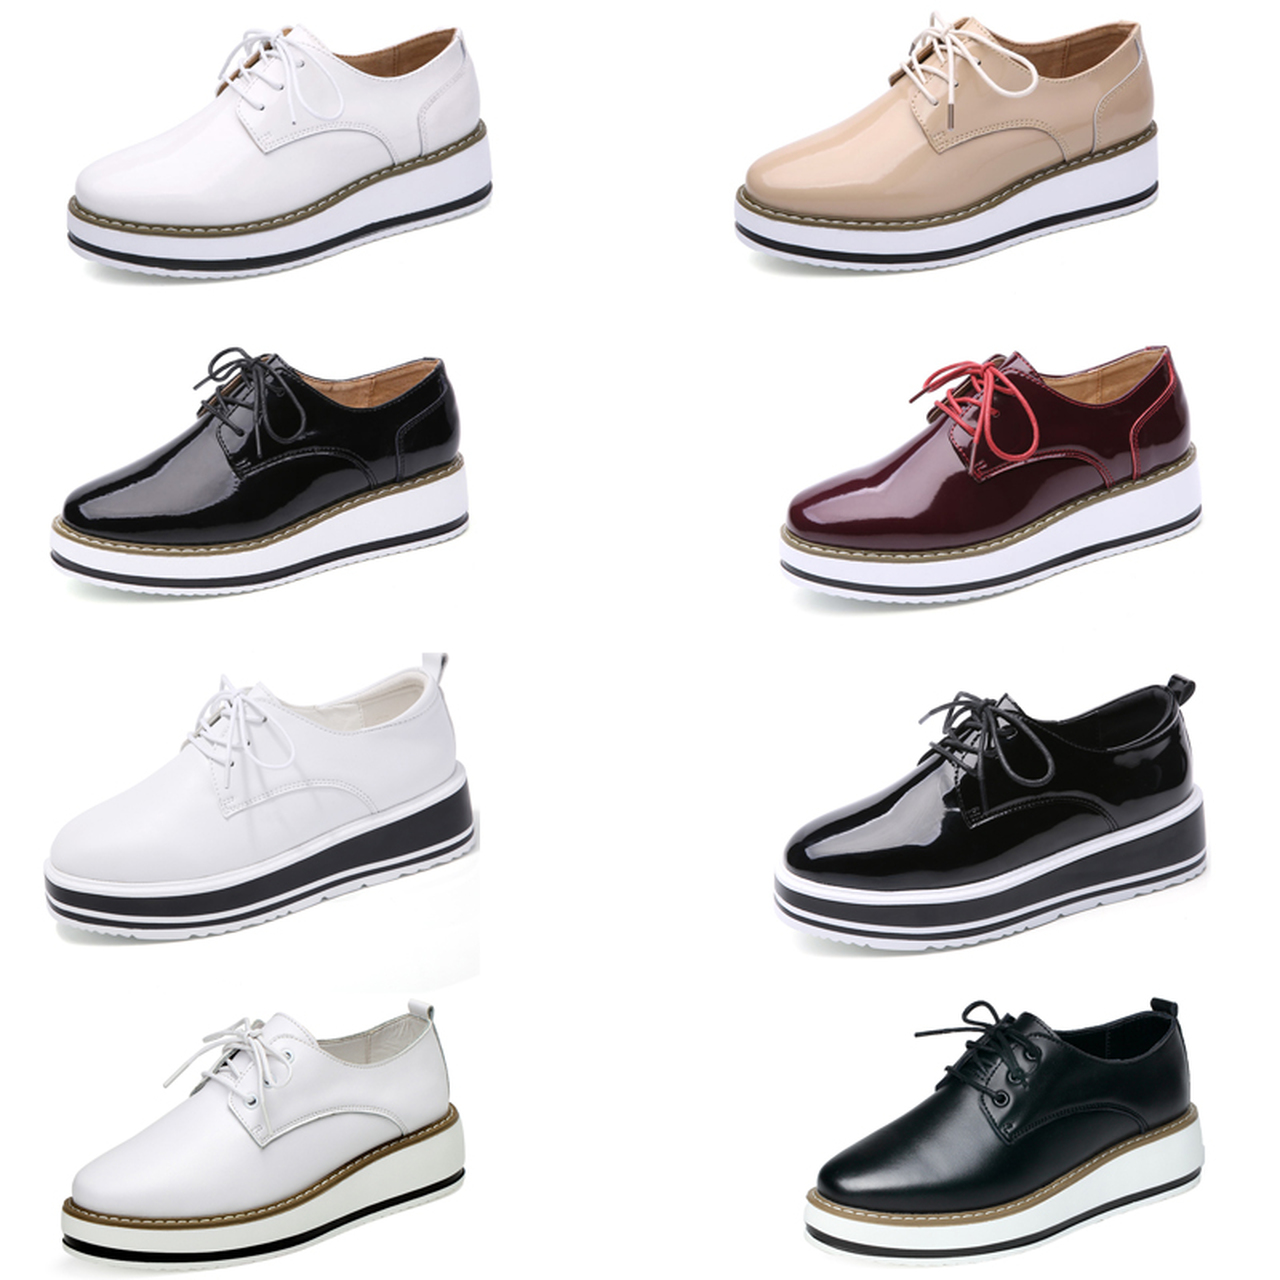 ed3cbf706bb ... EOFK Brand Spring Women Platform Shoes Woman Brogue Patent Leather  Flats Lace Up Footwear Female Flat ...